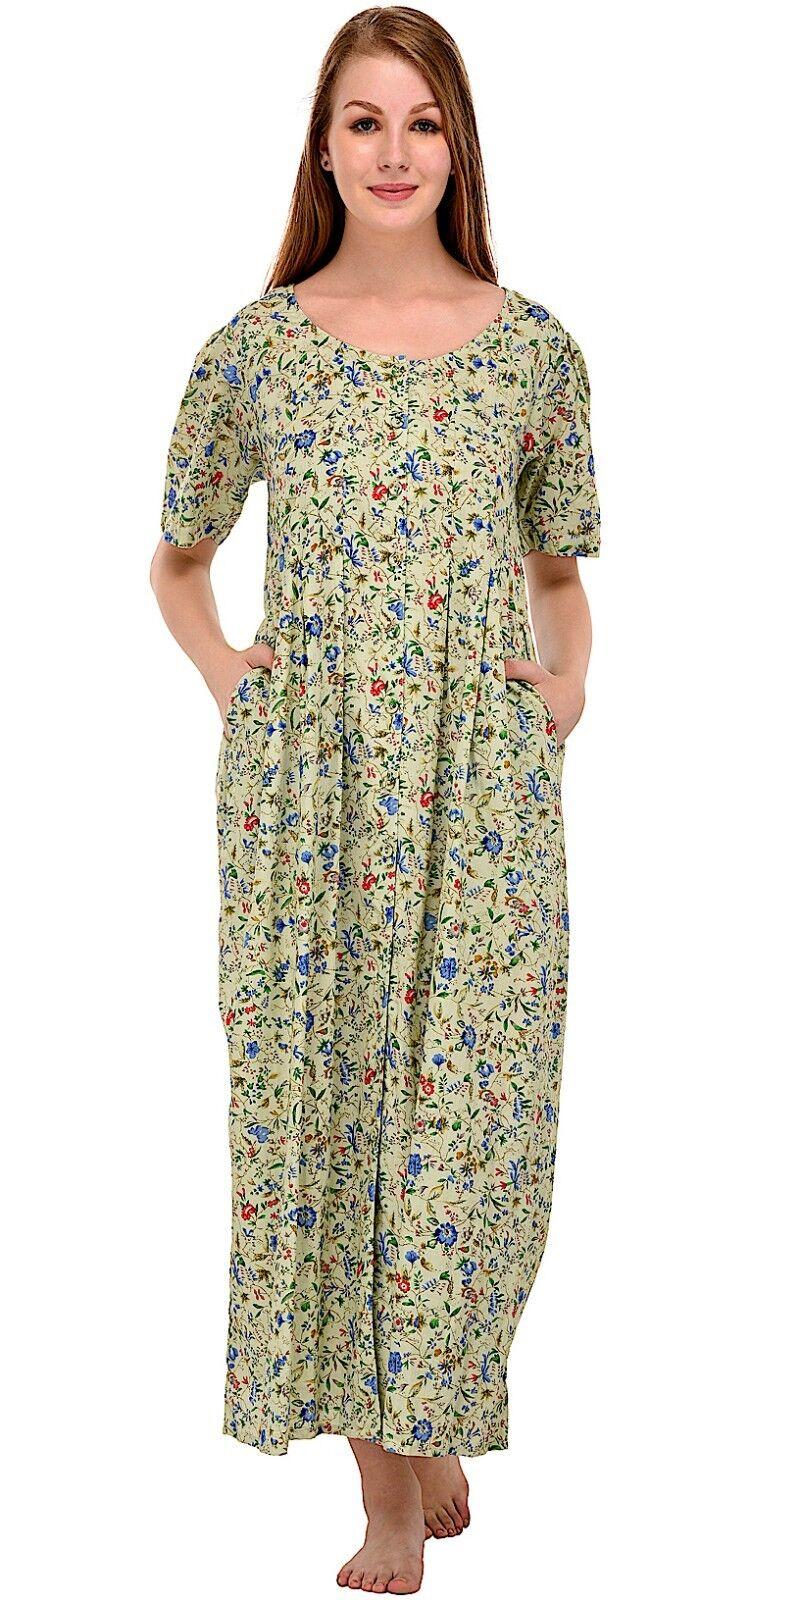 Cotton Lane Wrinkle-resistant Printed Dress D48 Apple